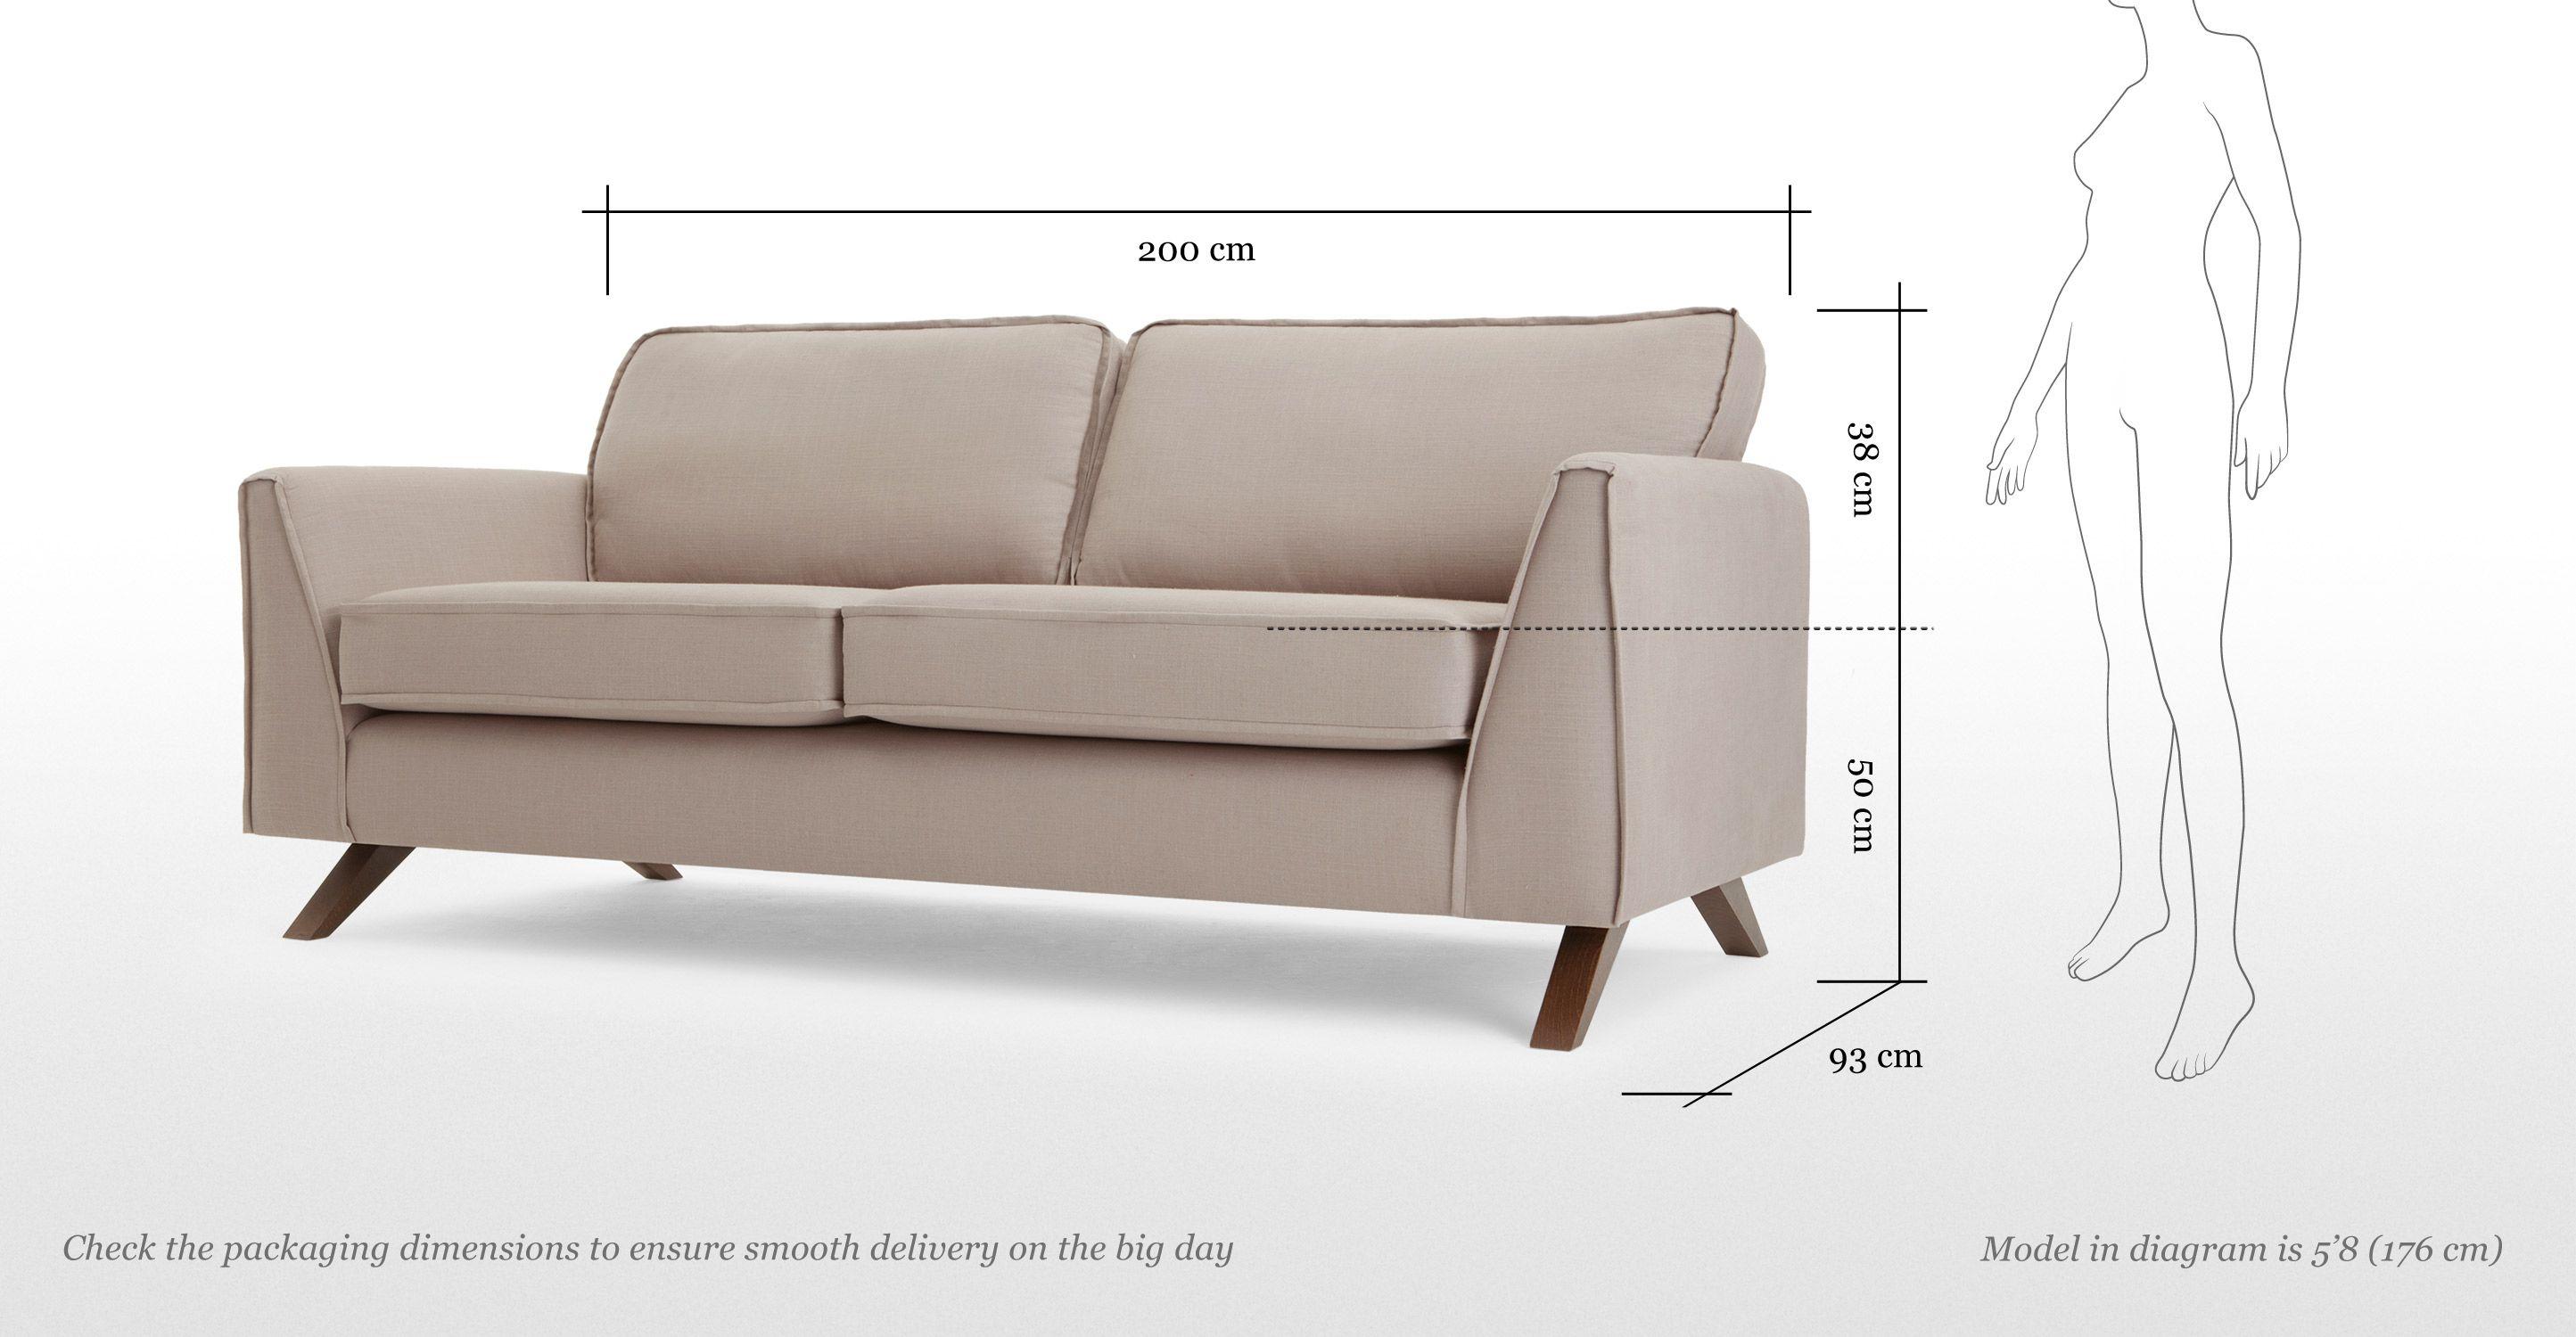 Drake 4 Seater Modular Chaise Fantastic Furniture Chaise Seater Fantastic Furniture